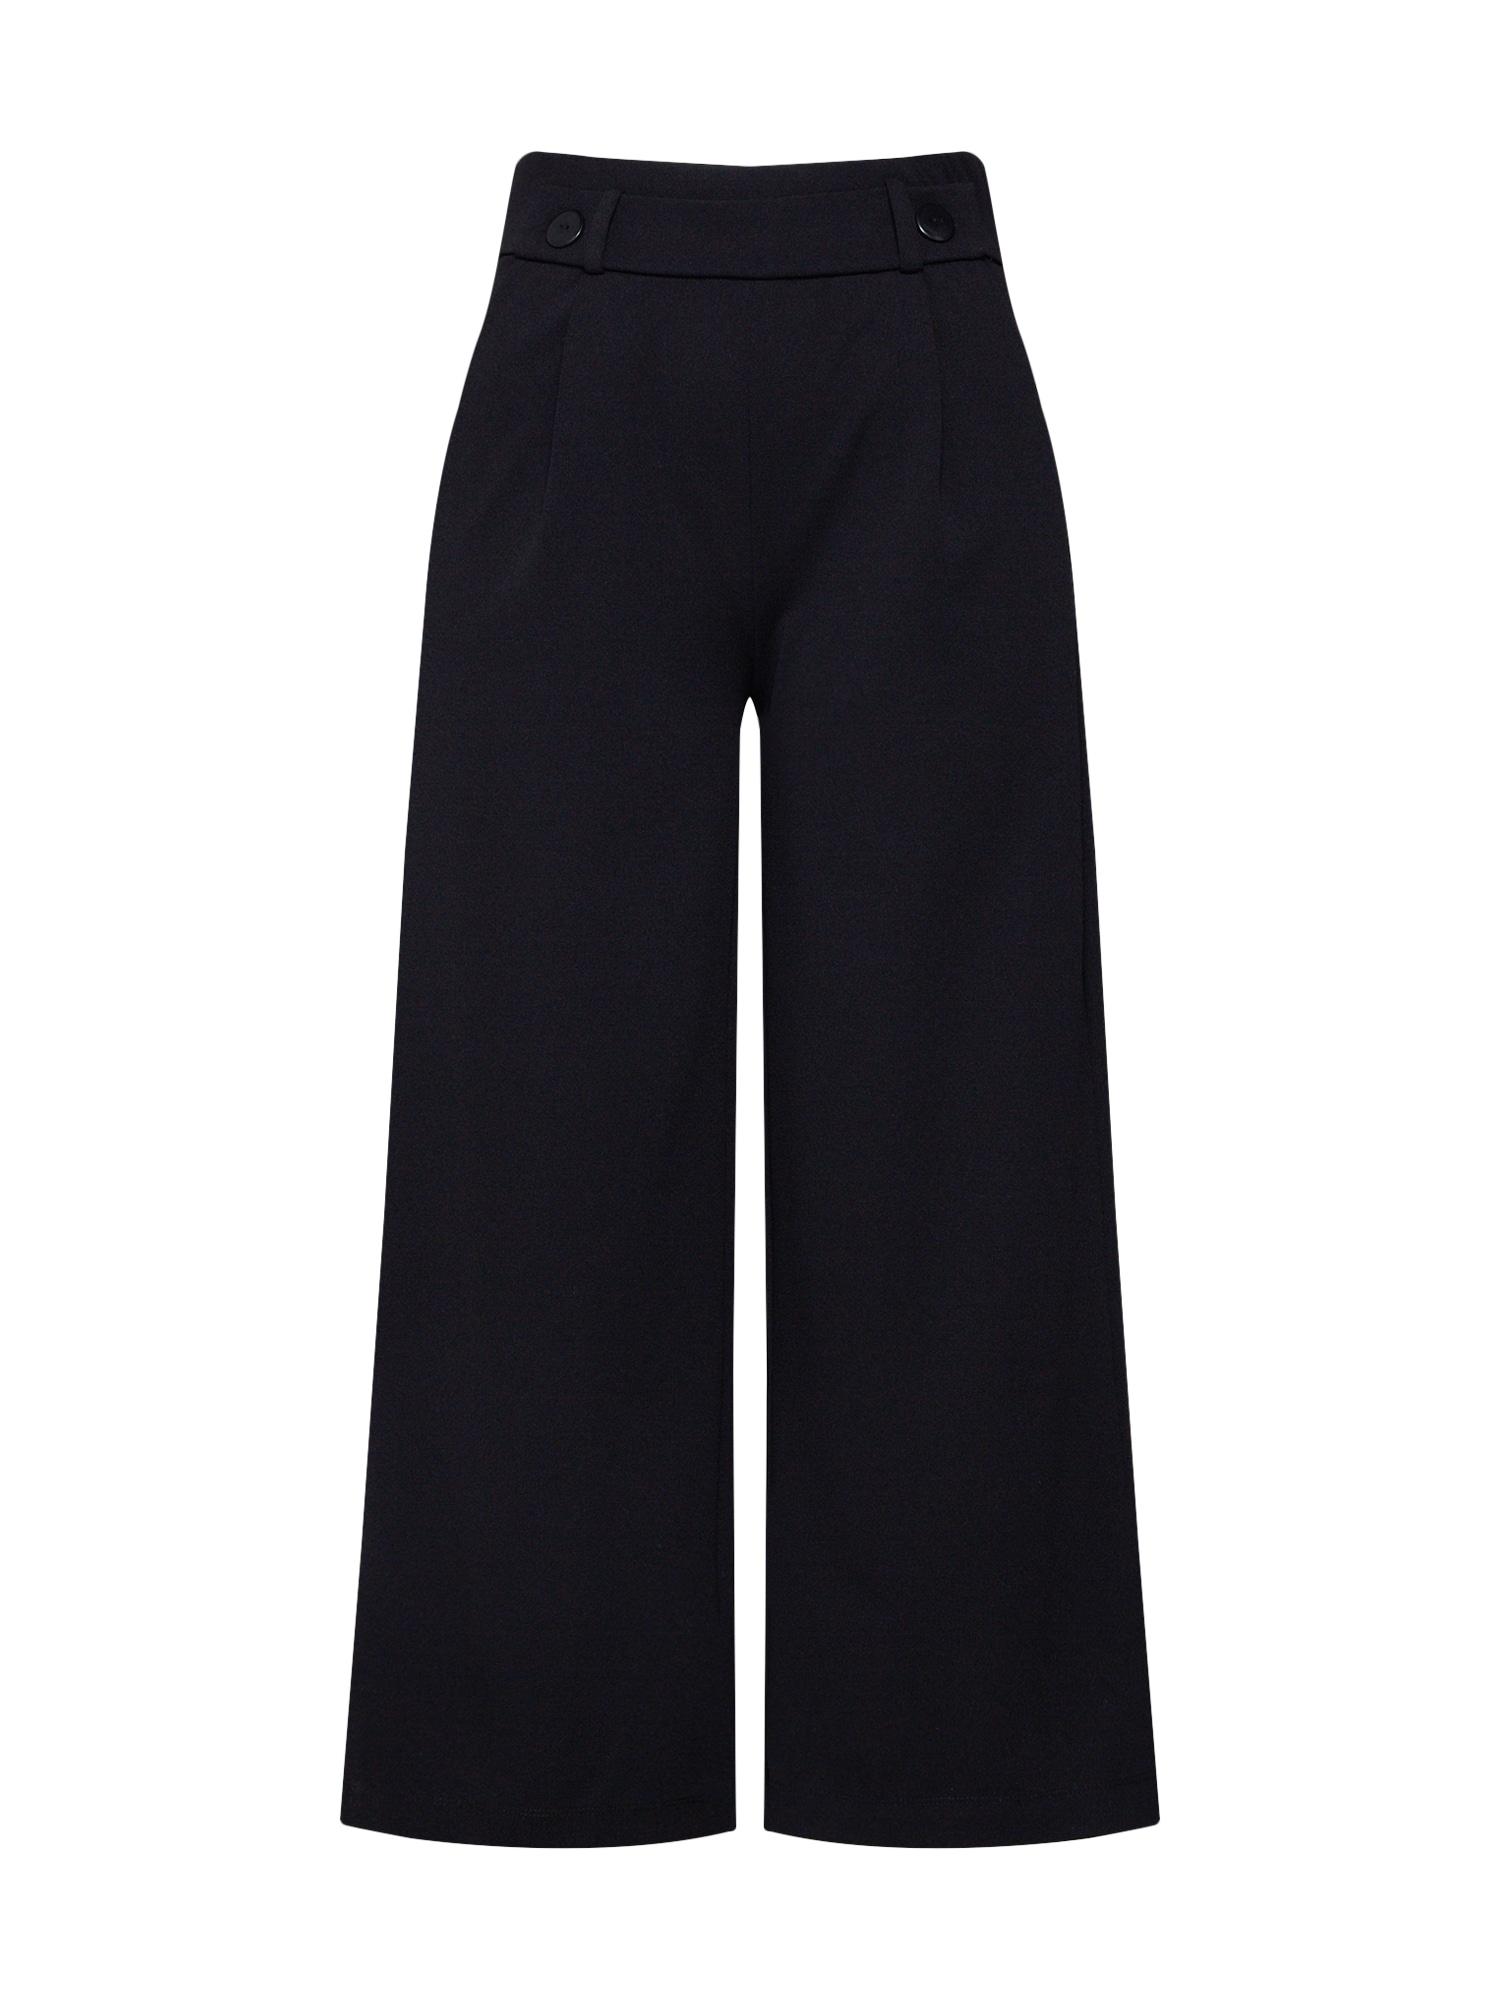 JACQUELINE de YONG Plisované nohavice 'GEGGO'  čierna